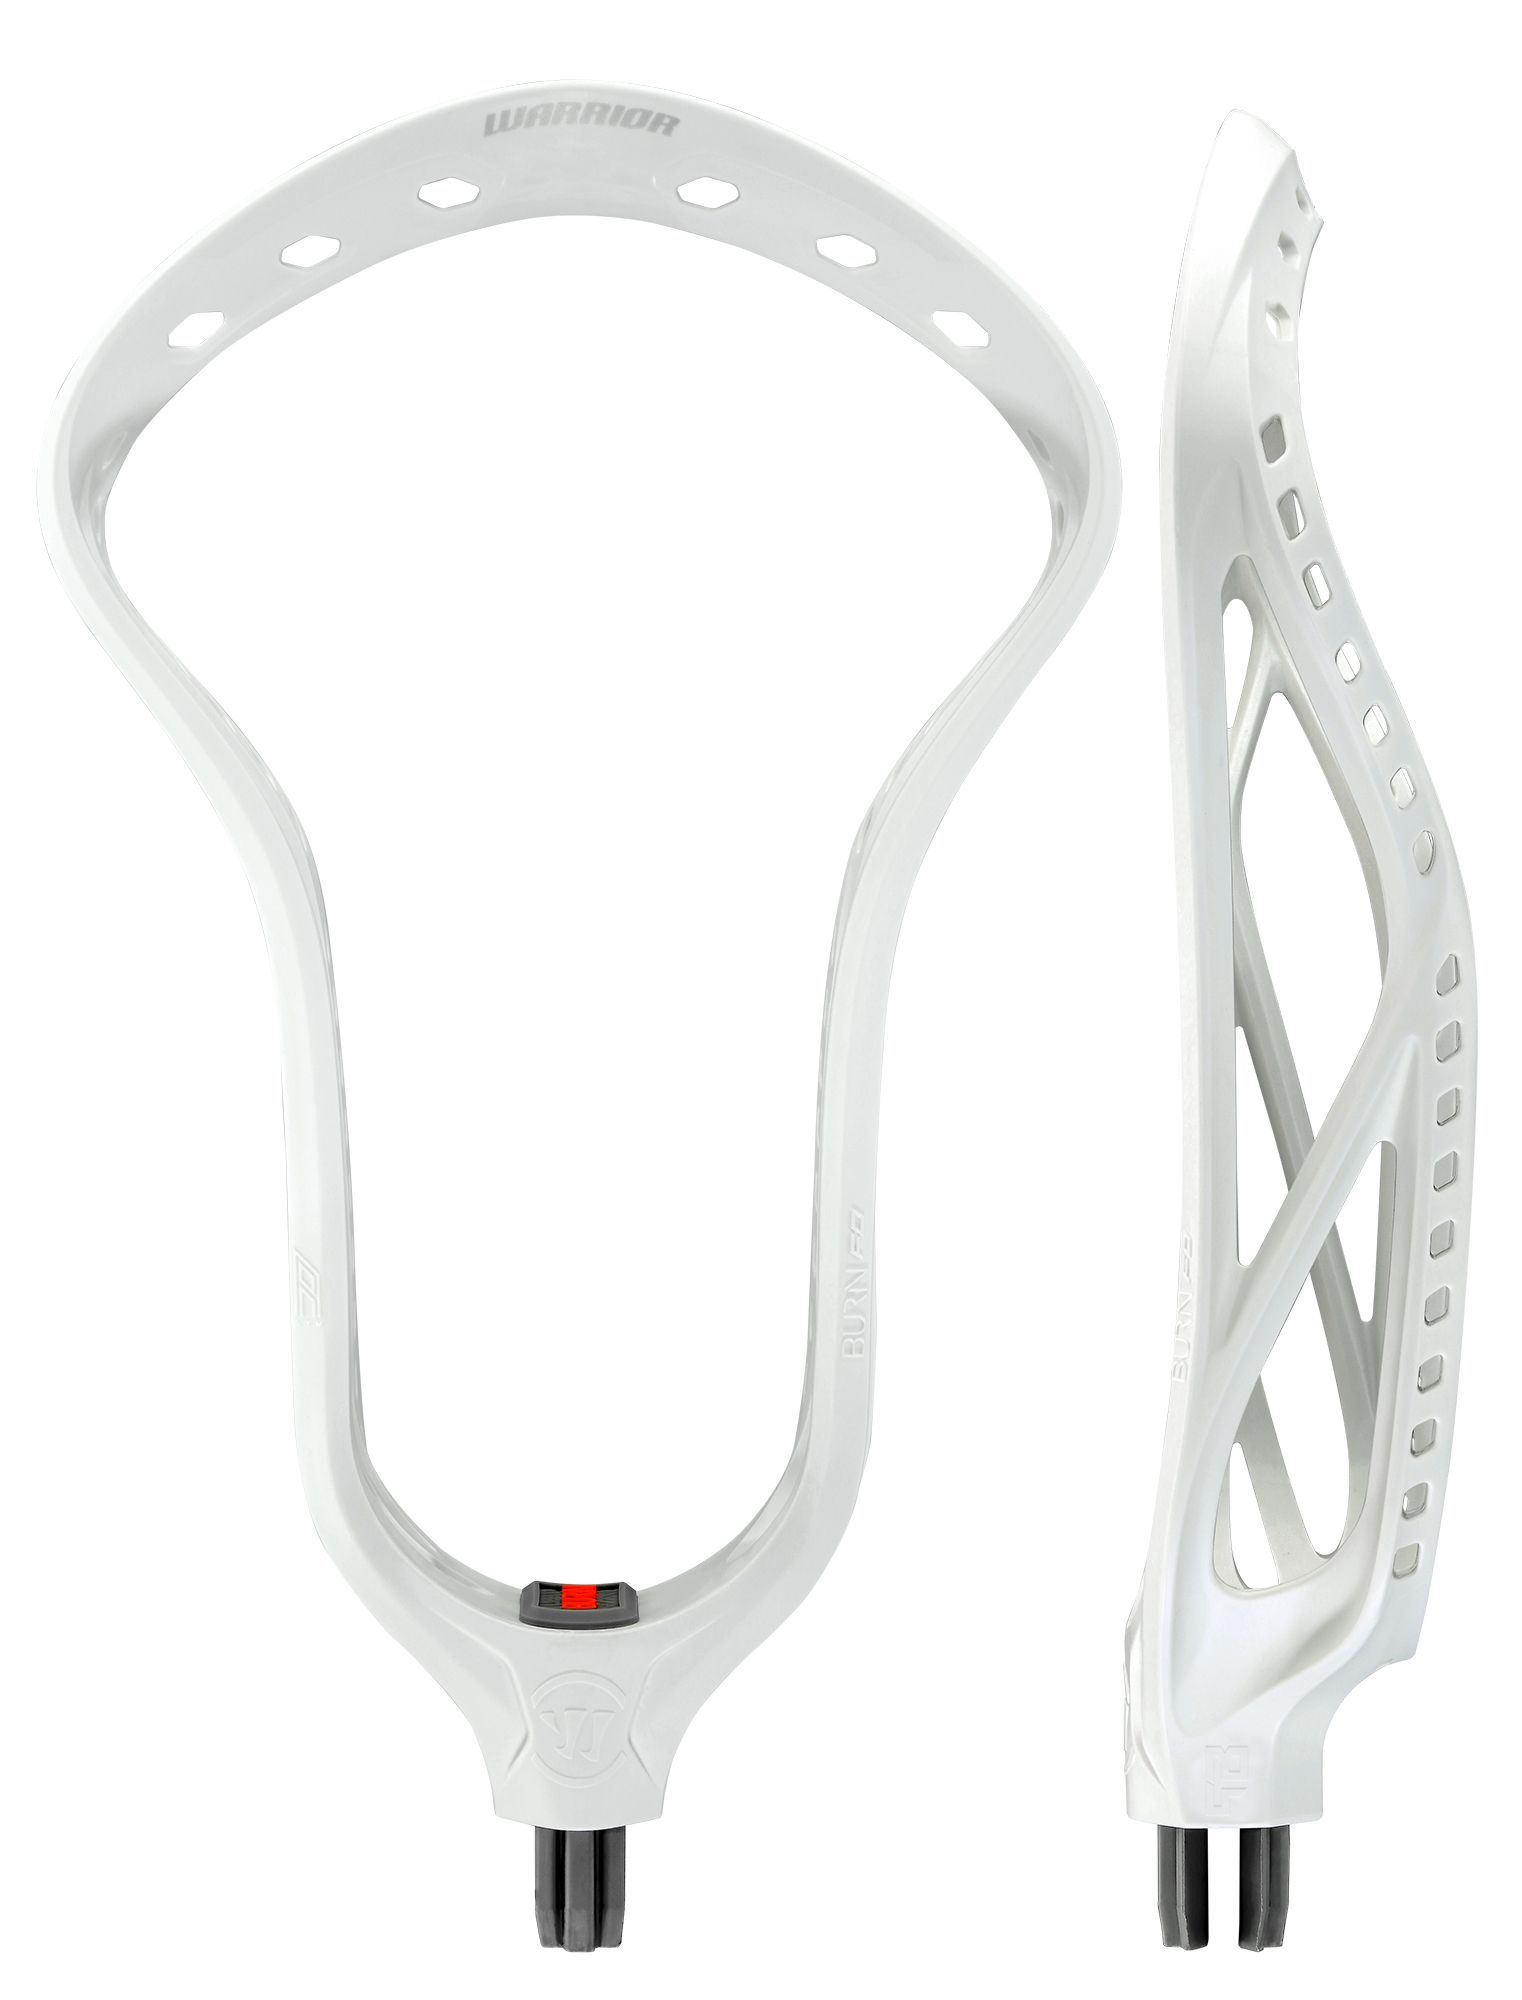 Warrior Burn X Unstrung Lacrosse Head